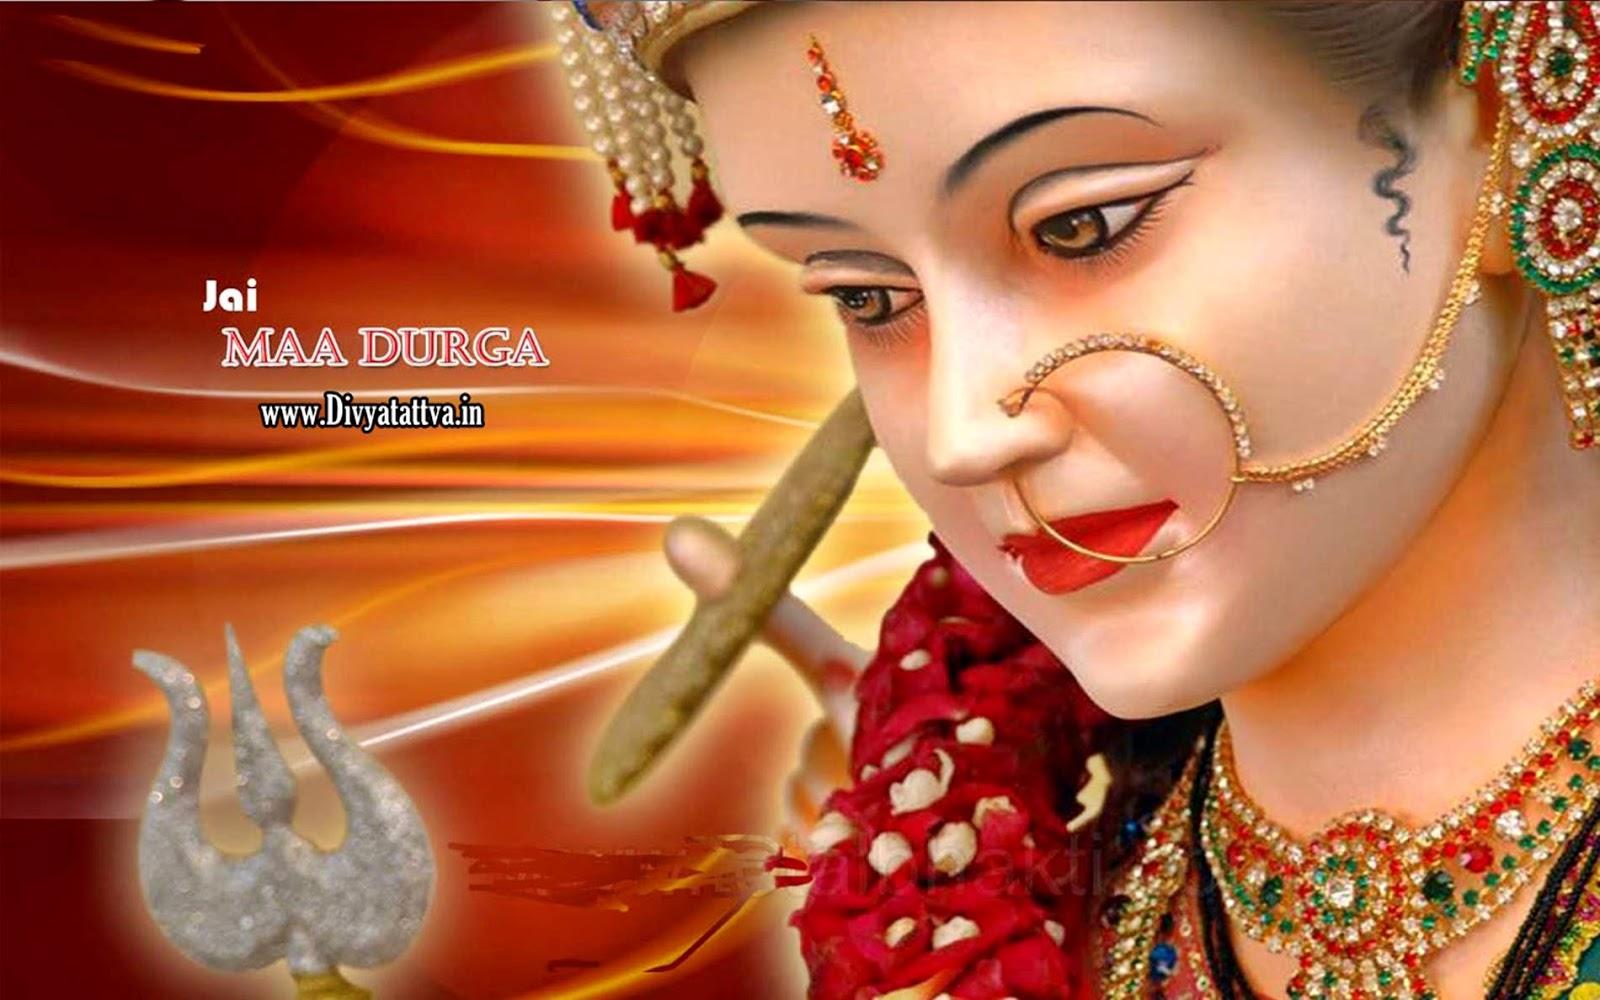 Divyatattva Astrology Free Horoscopes Psychic Tarot Yoga Tantra